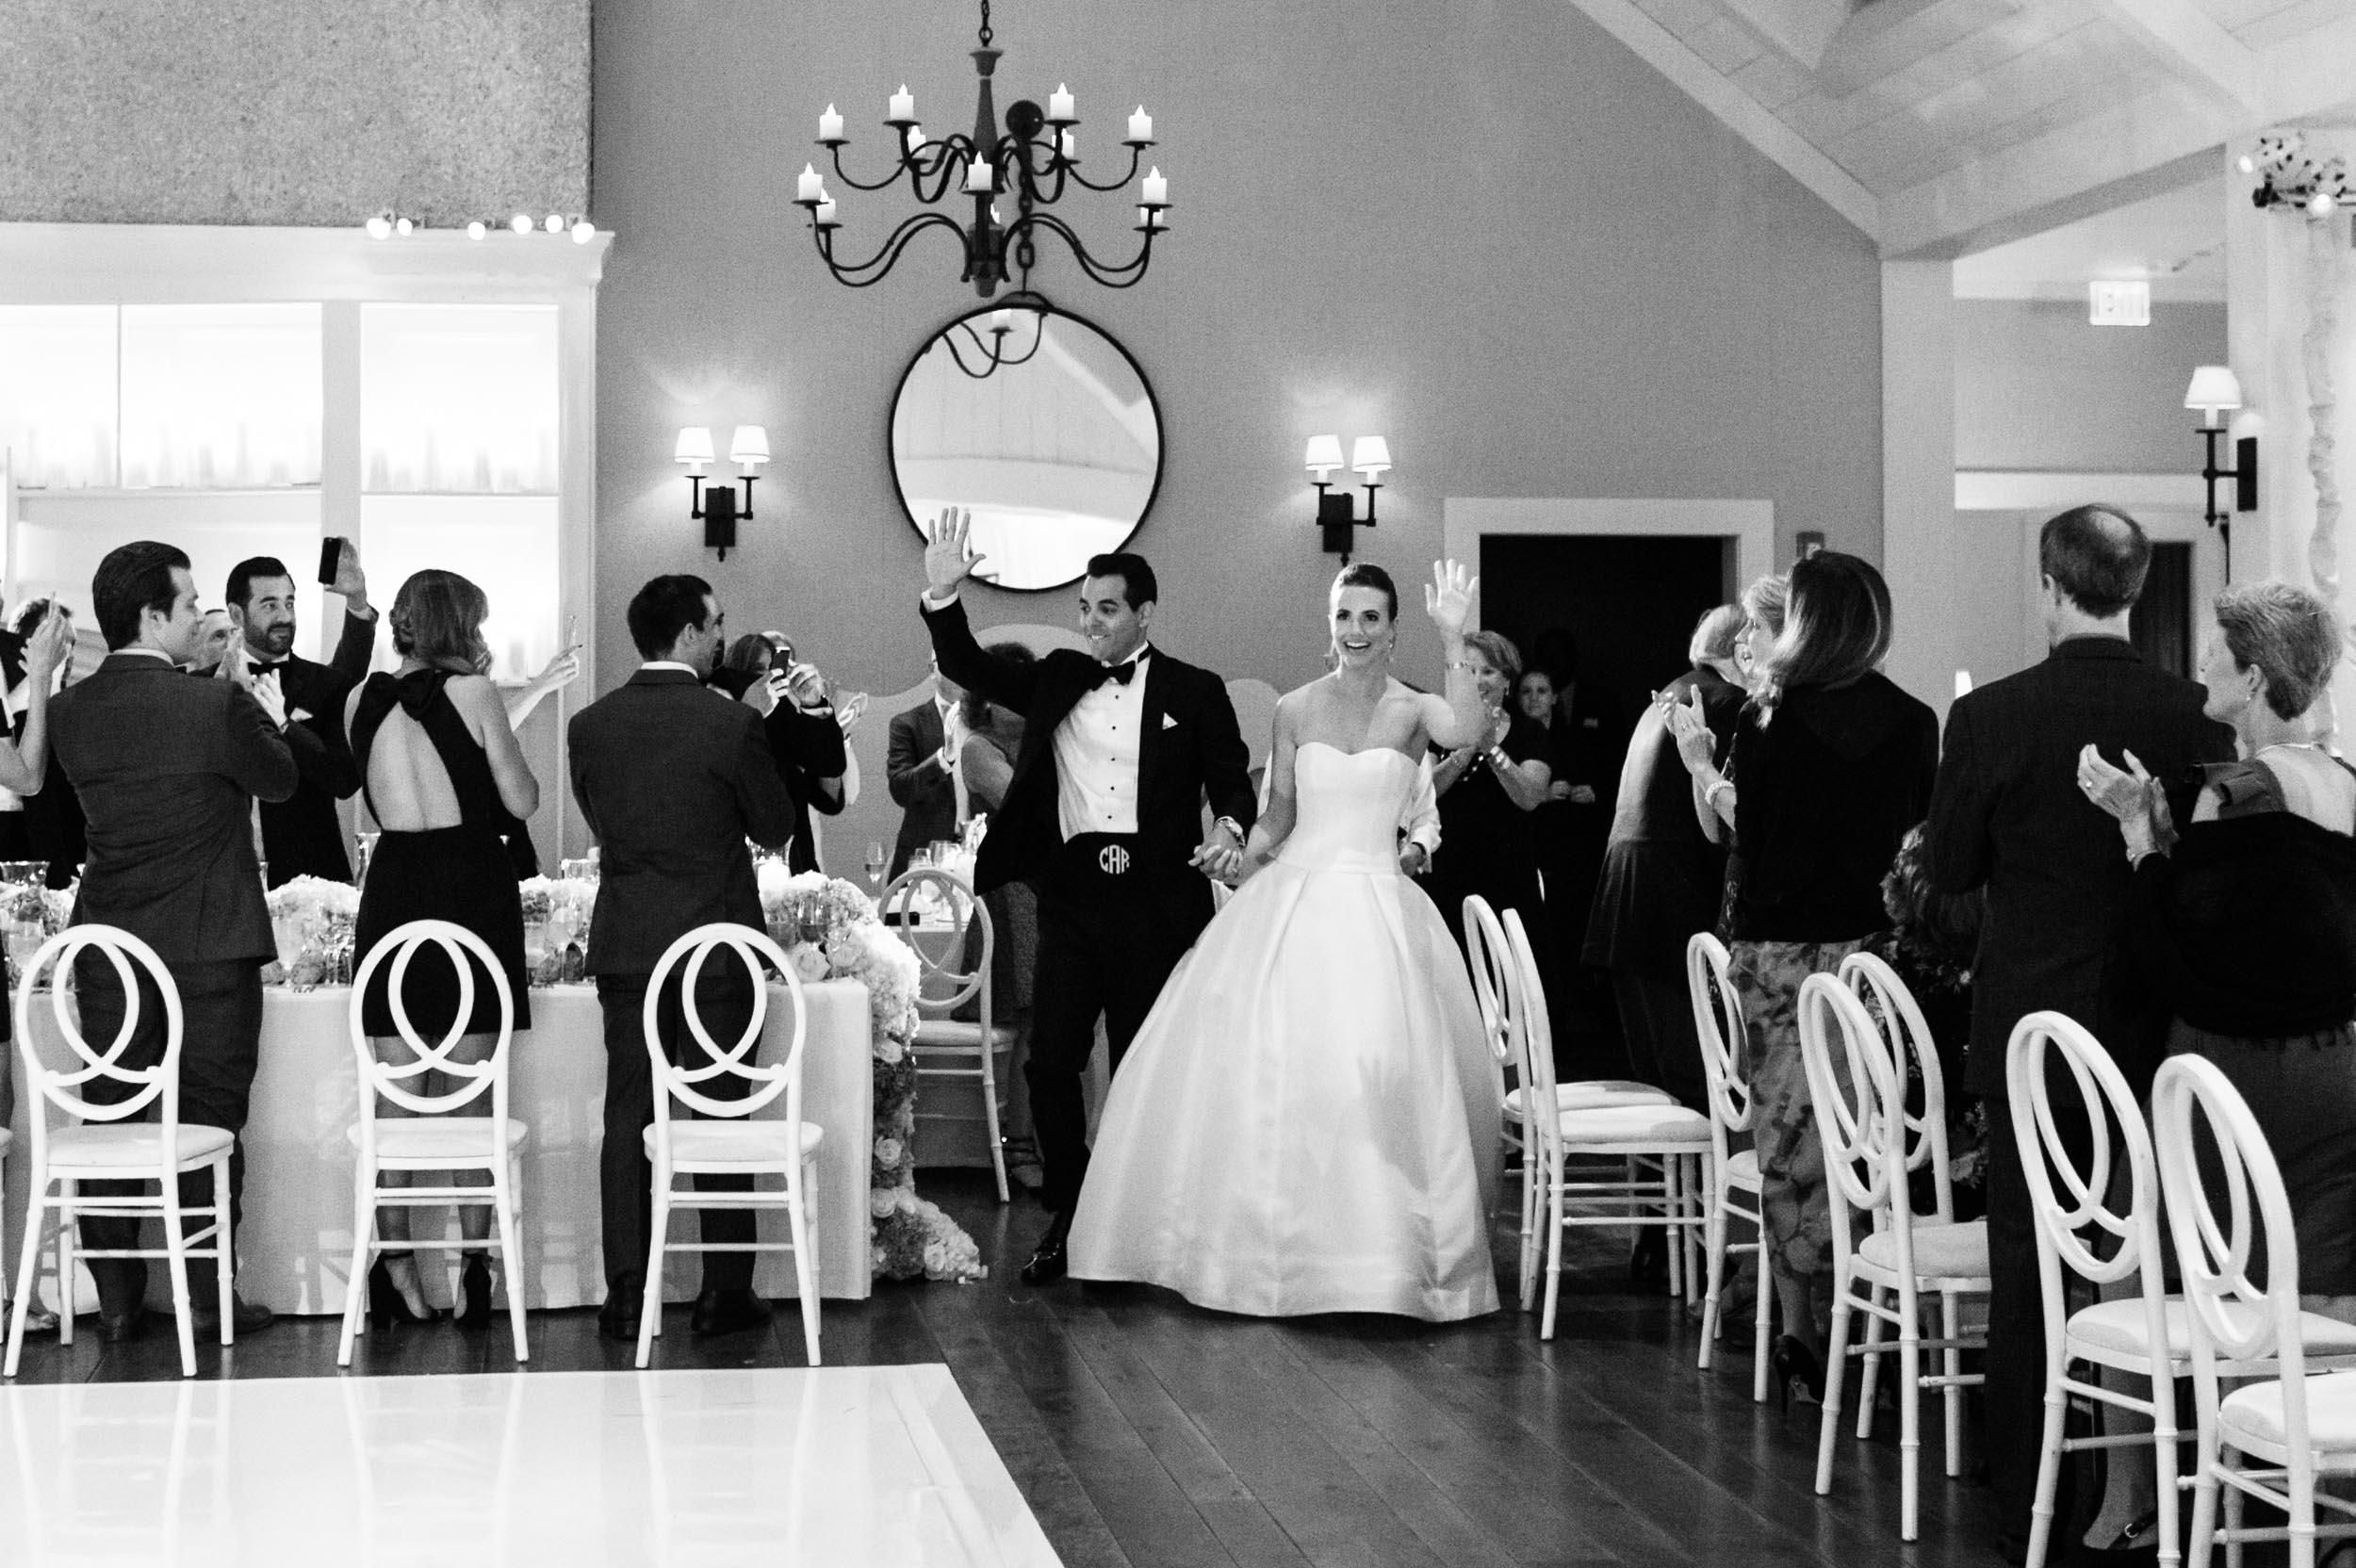 Bride and groom entering the wedding reception at Kiawah Island Golf Resort